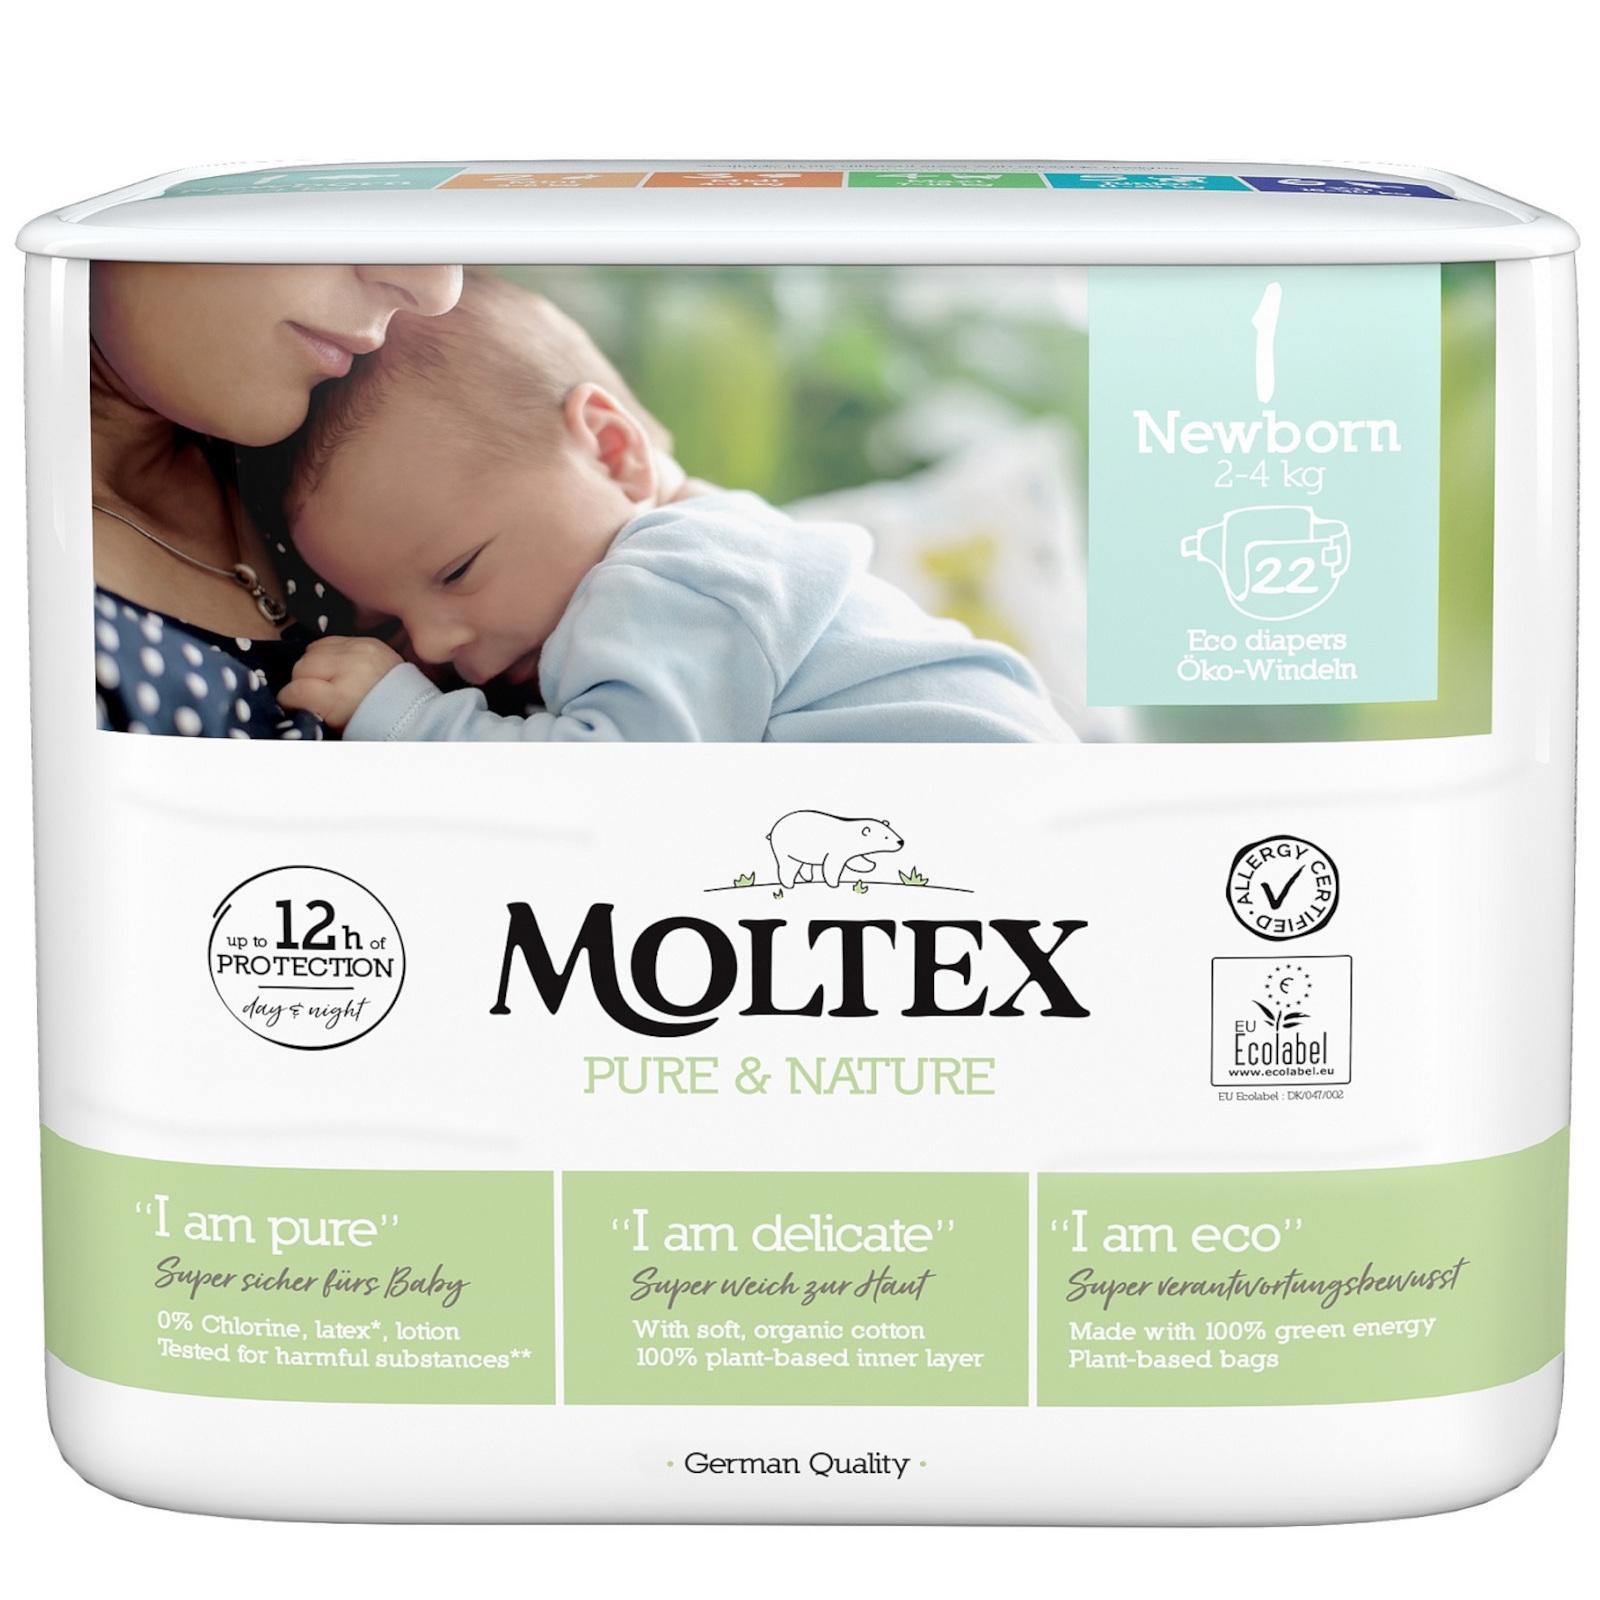 Moltex Dětské plenky Newborn 2-4 kg Pure & Nature 22 ks